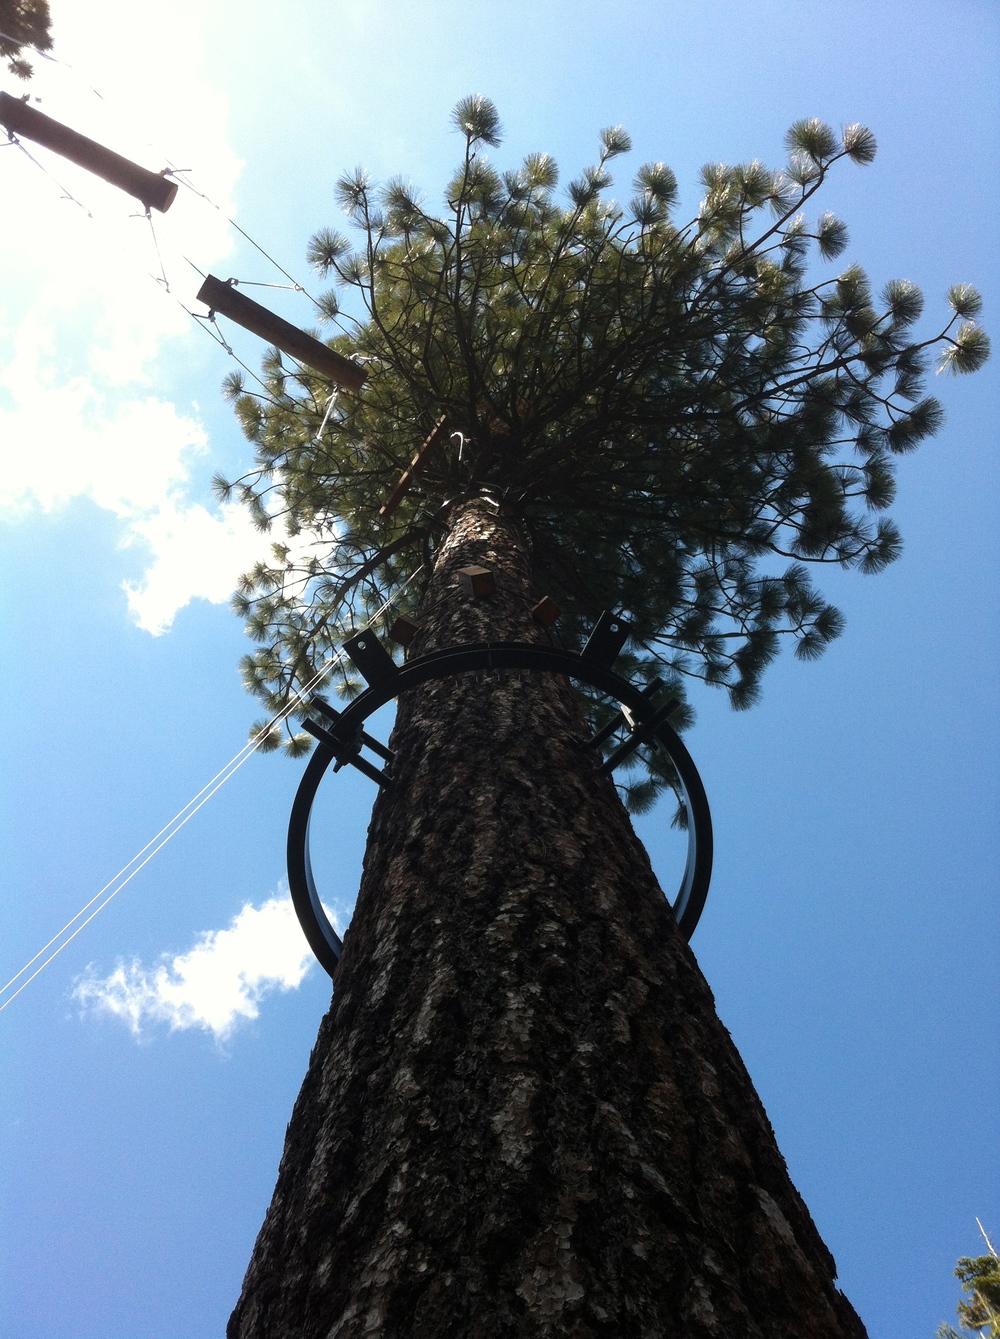 Environmentally friendly tree ring